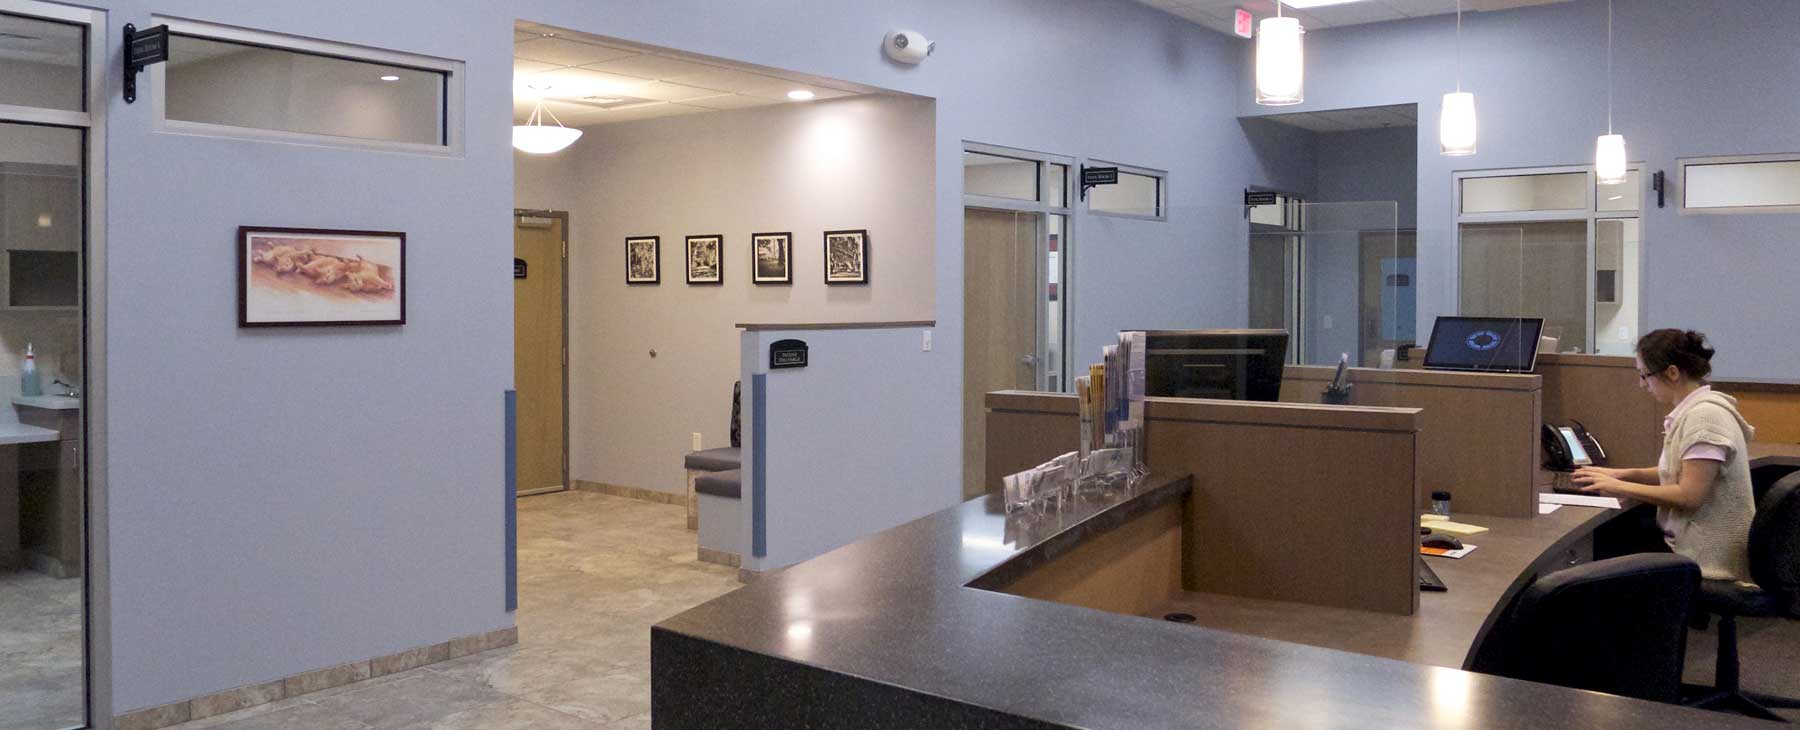 billing charleston veterinary referral center